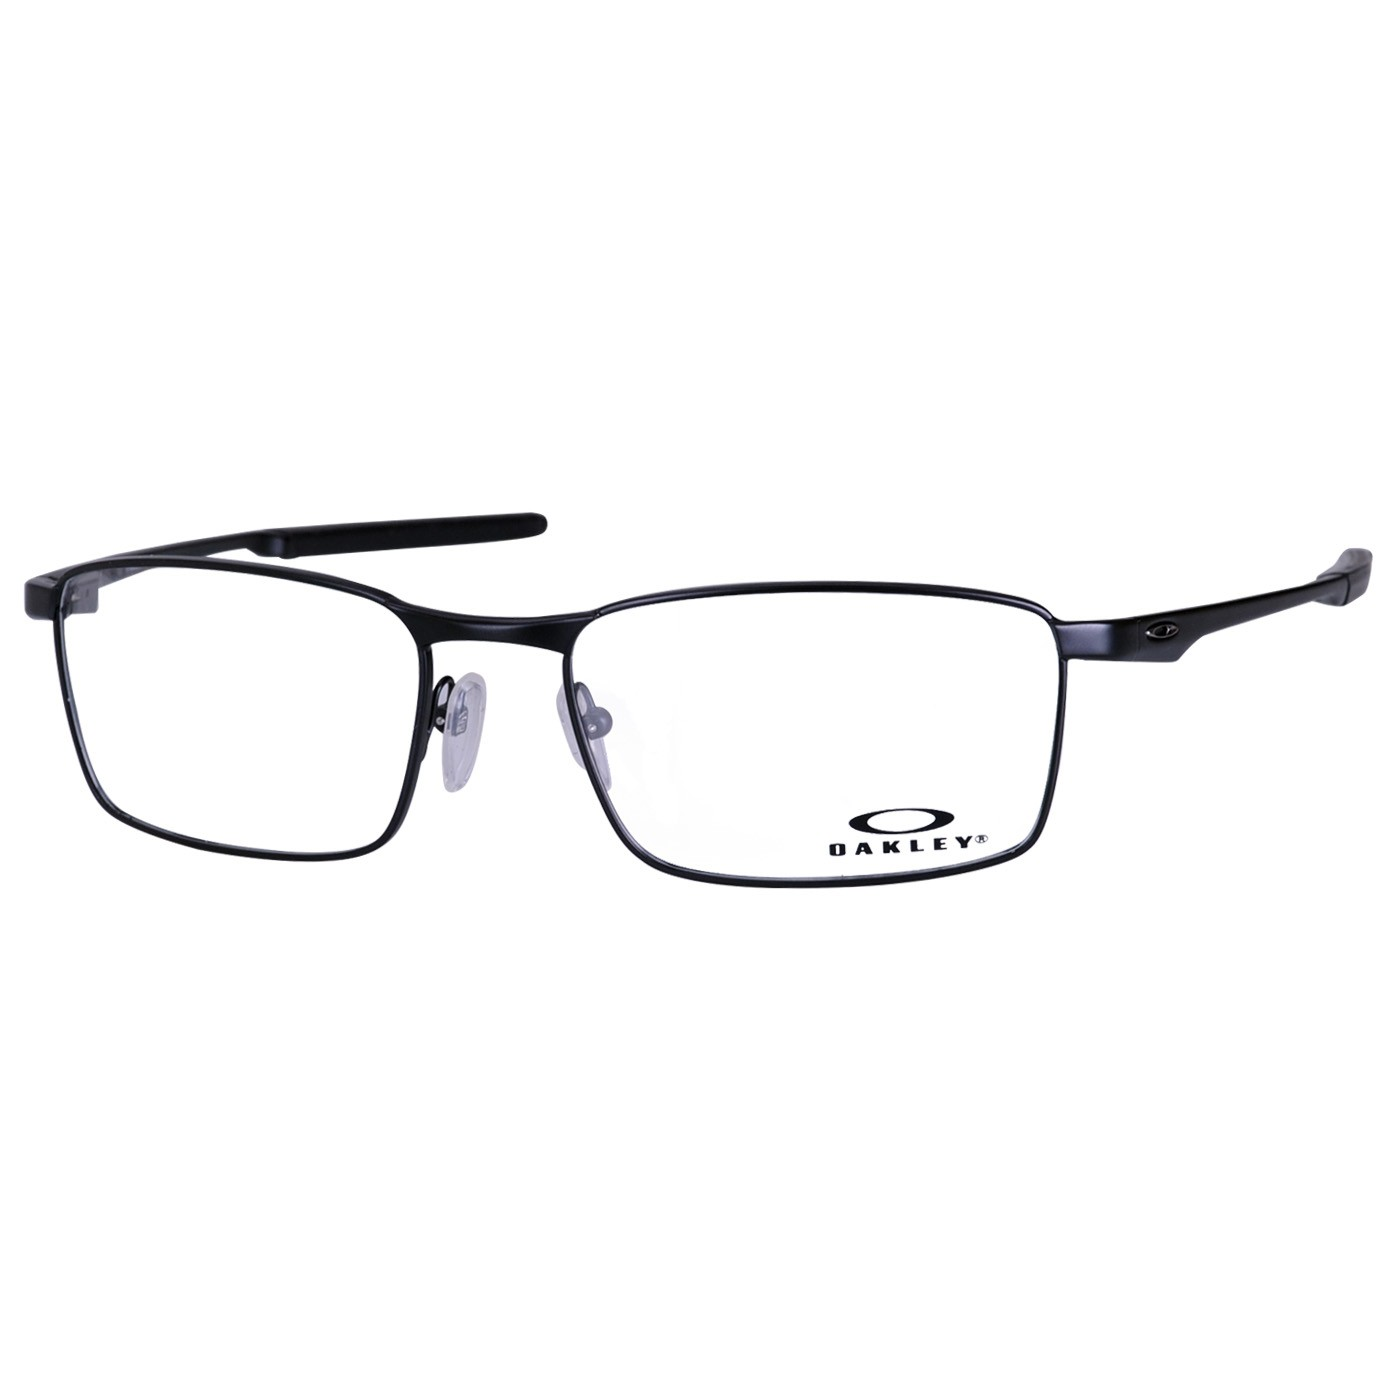 Óculos de Grau Oakley Fuller OX3227 Metal Preto Fosco Masculino